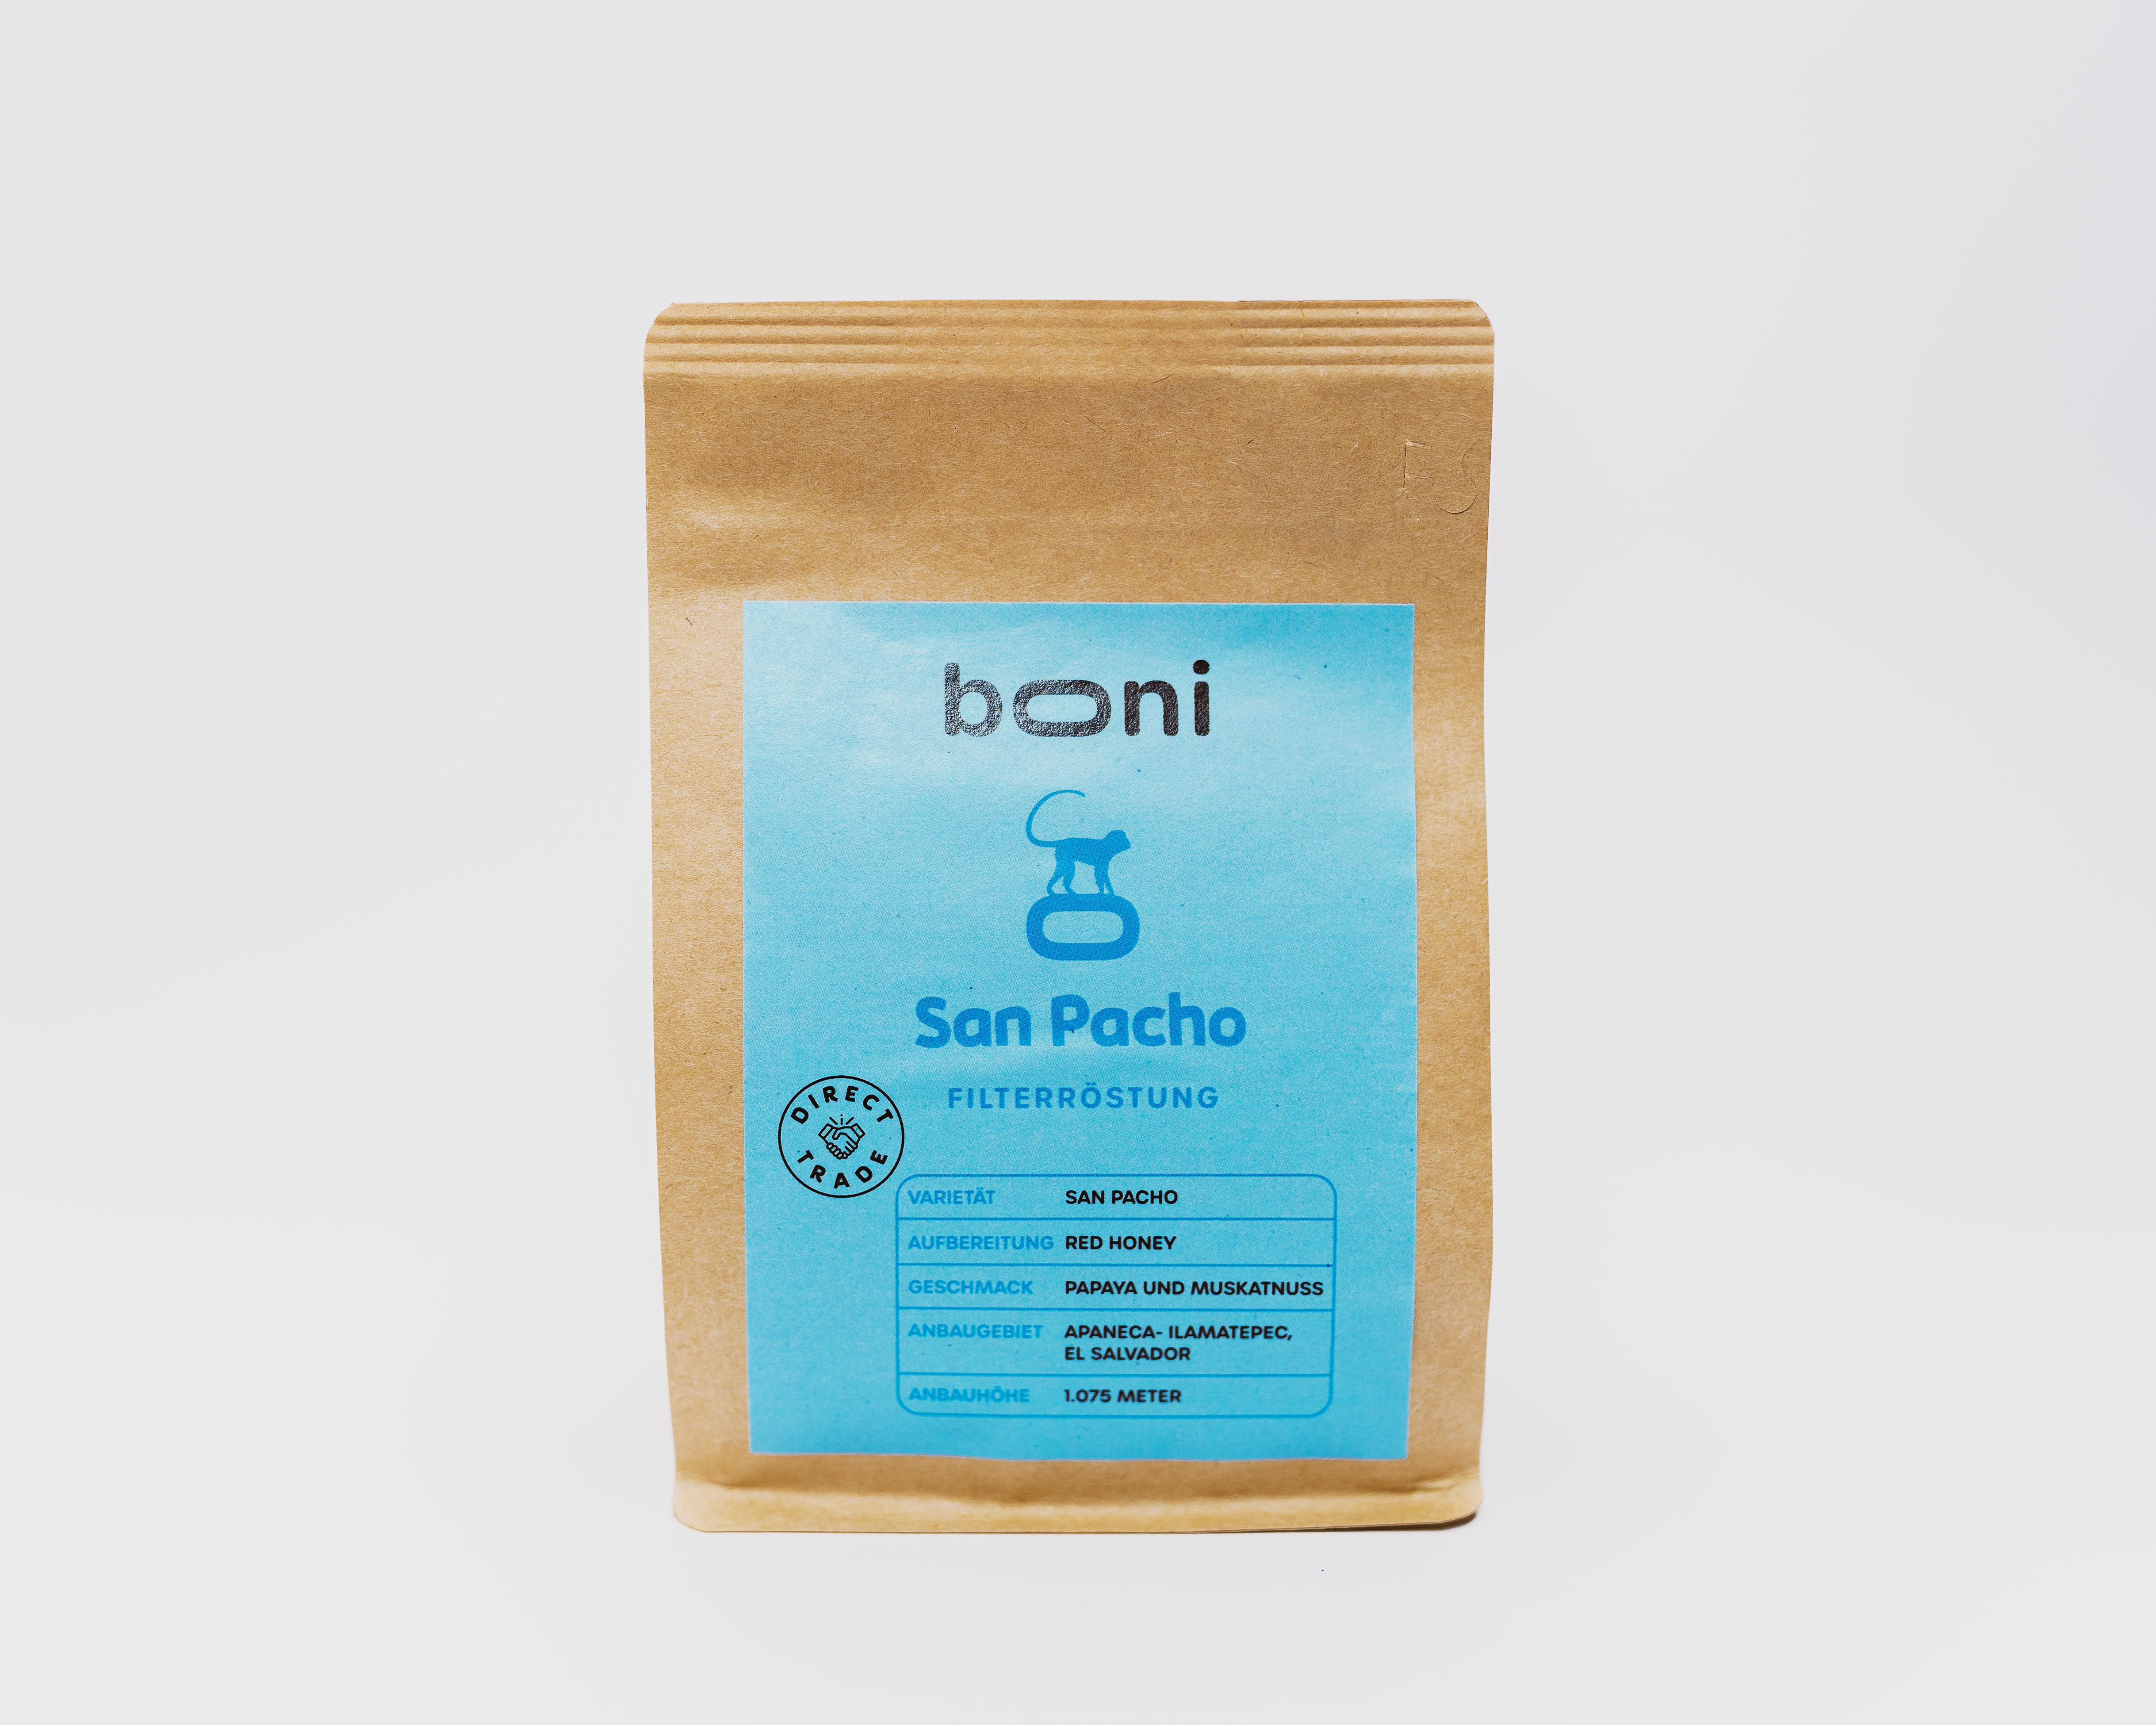 San Pacho - Filterröstung